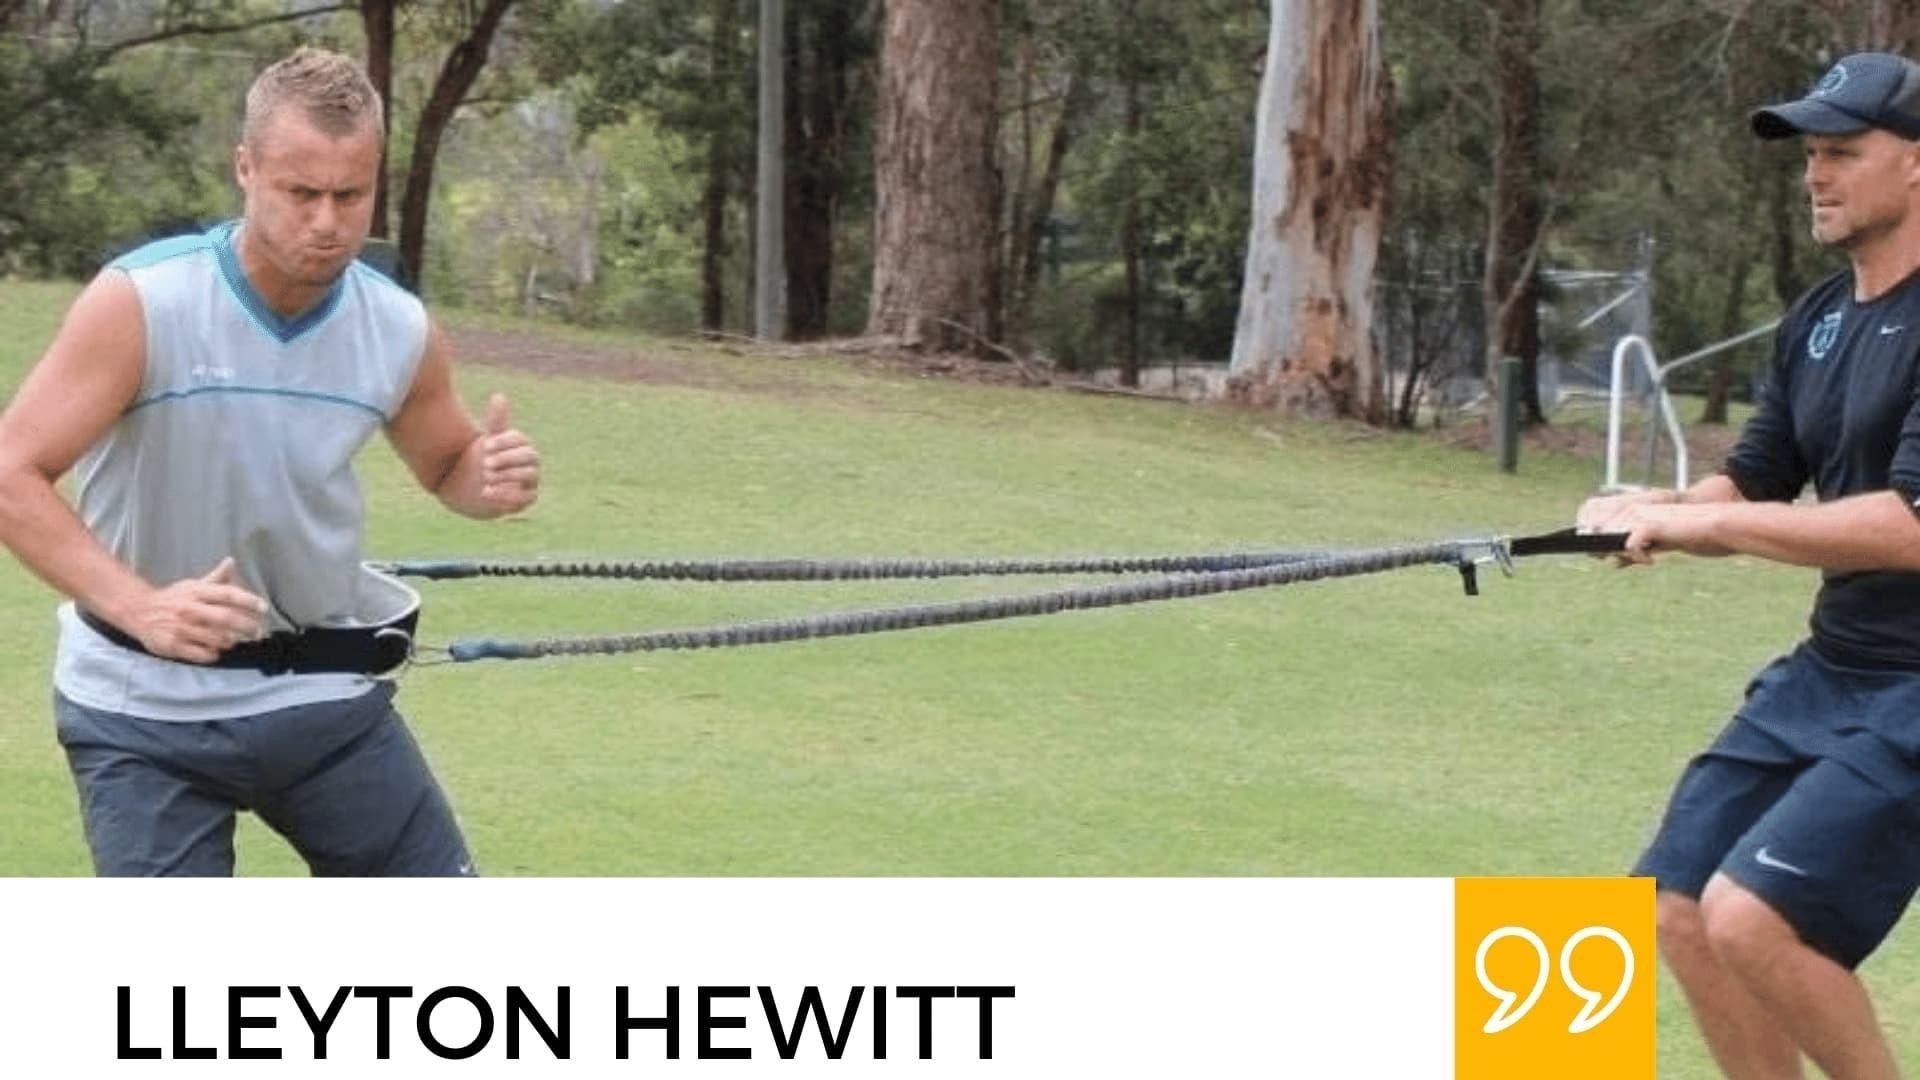 lleyton-hewitt